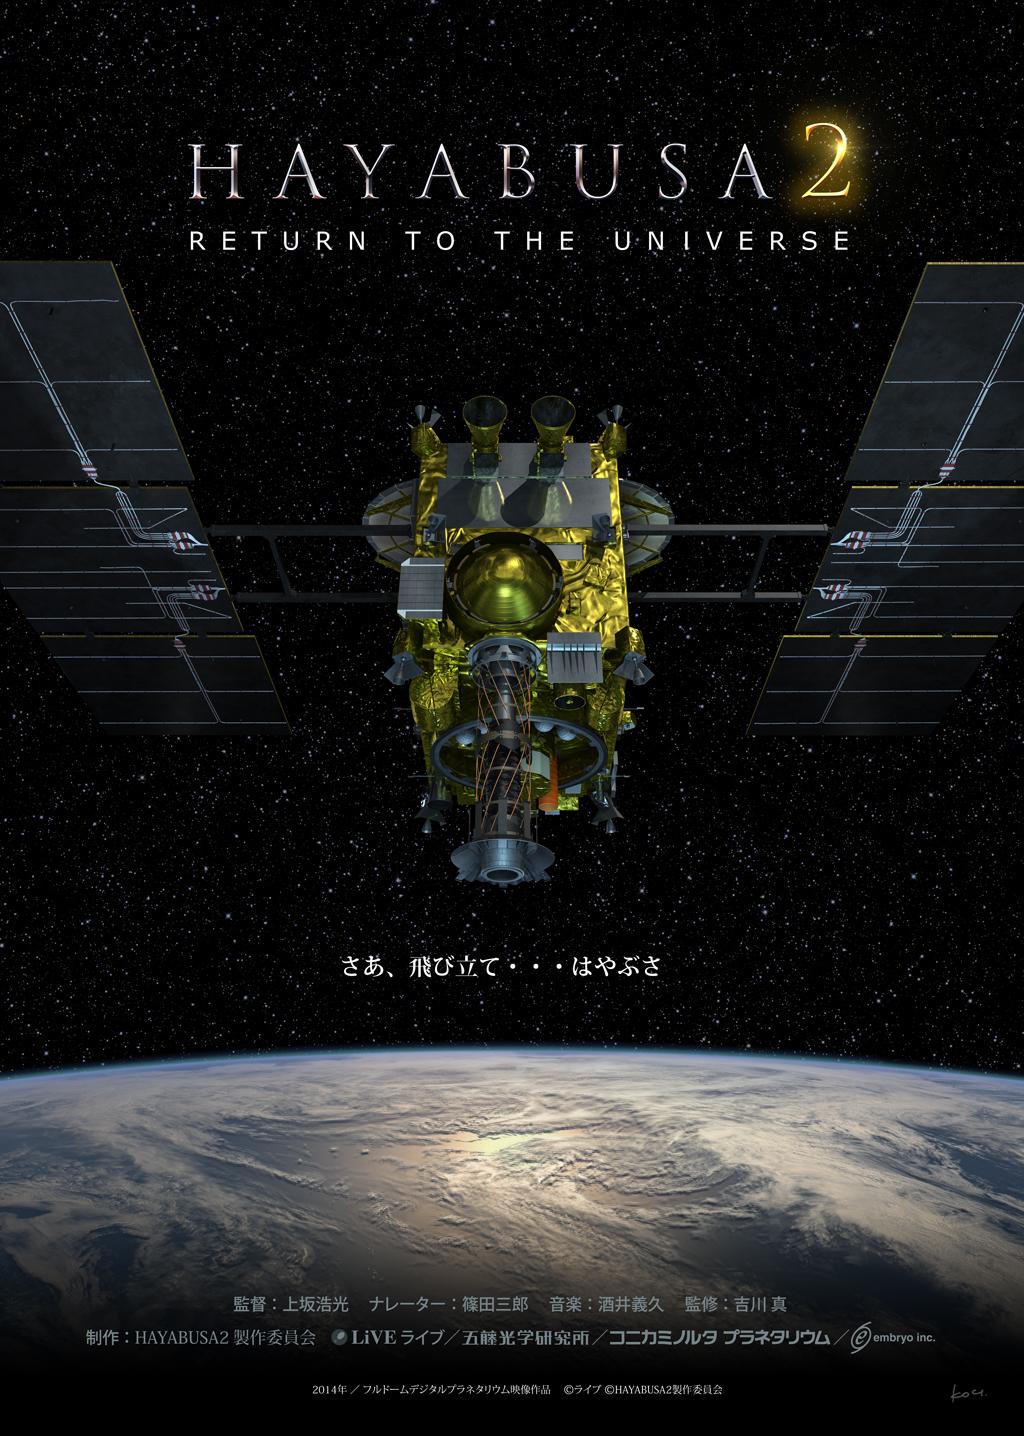 「HAYABUSA2 RERURN TO THE UNIVERSE」 画像提供 ㈲ライブ